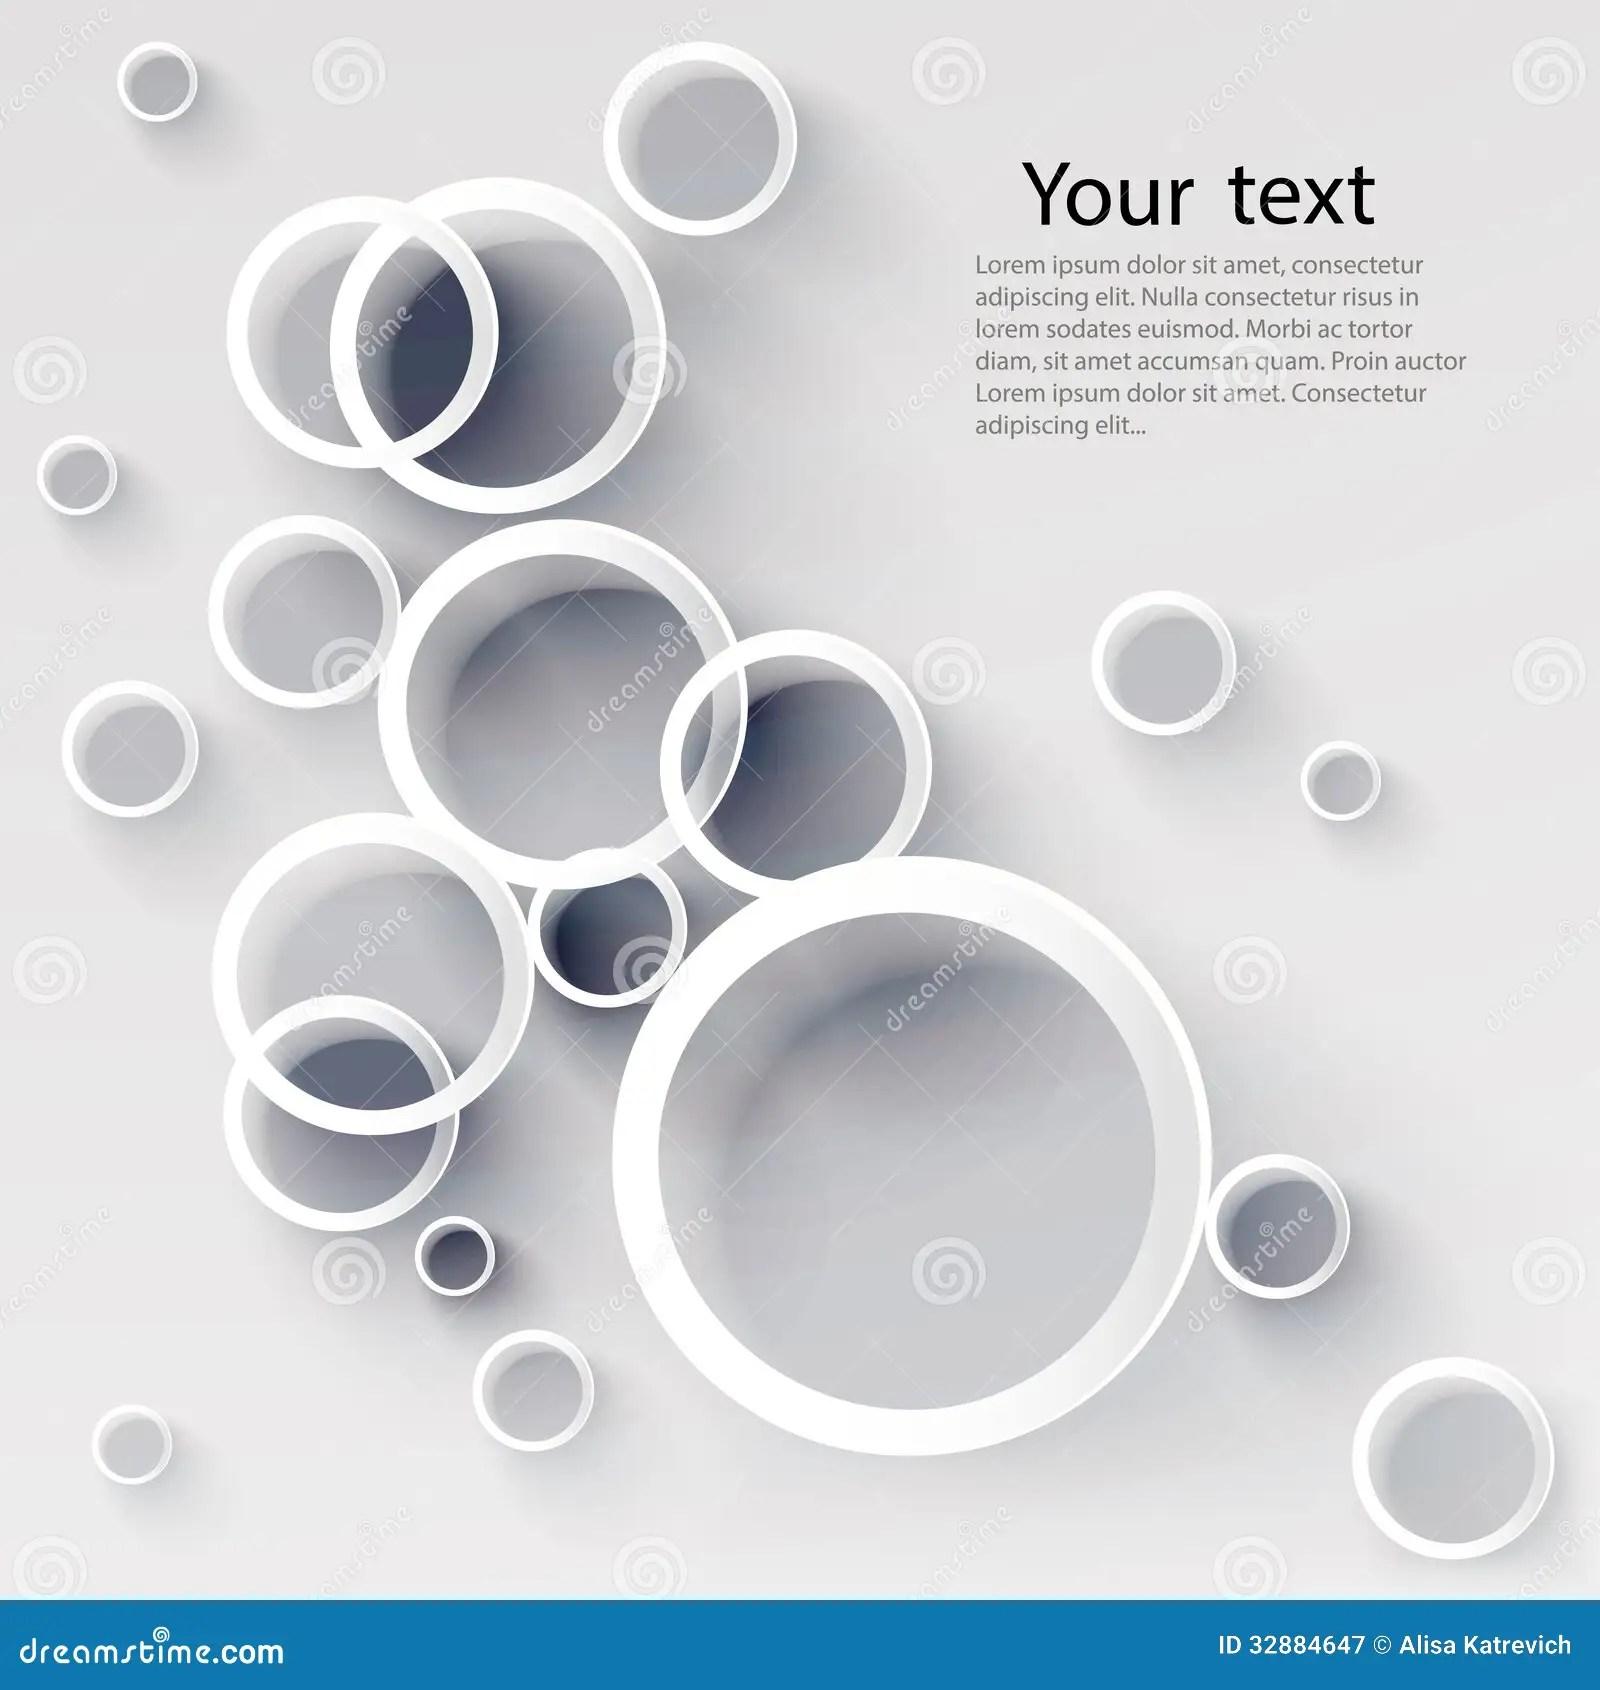 Elegant 3d Desktop Wallpaper Geometric Applique Circle Background Royalty Free Stock